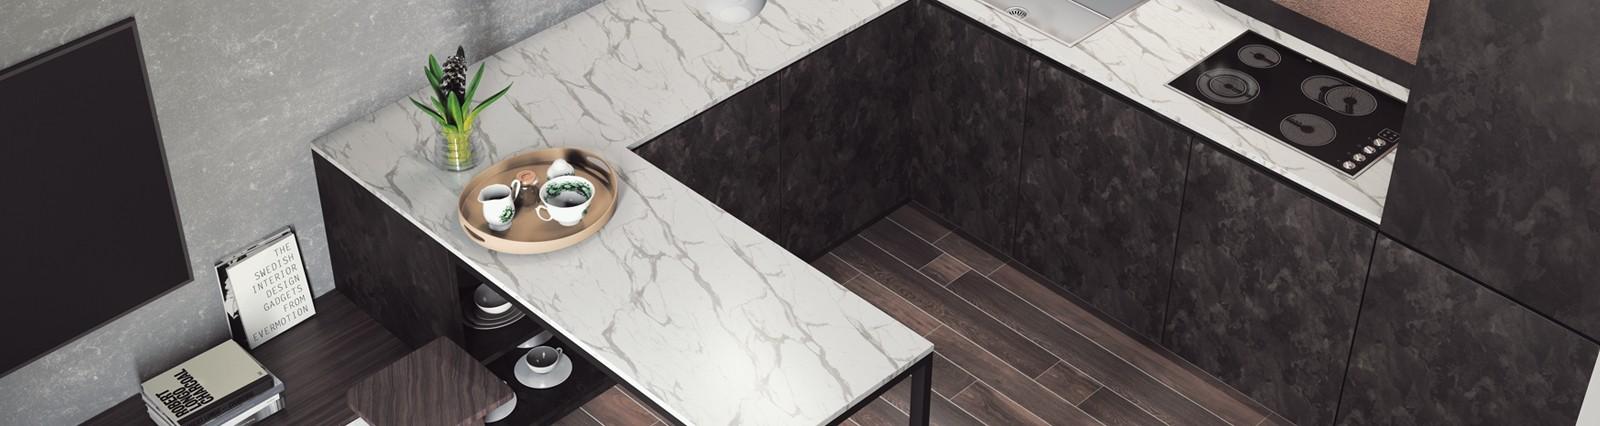 Stratus - Kitchen Surface Solutions Laminates - Greenlam